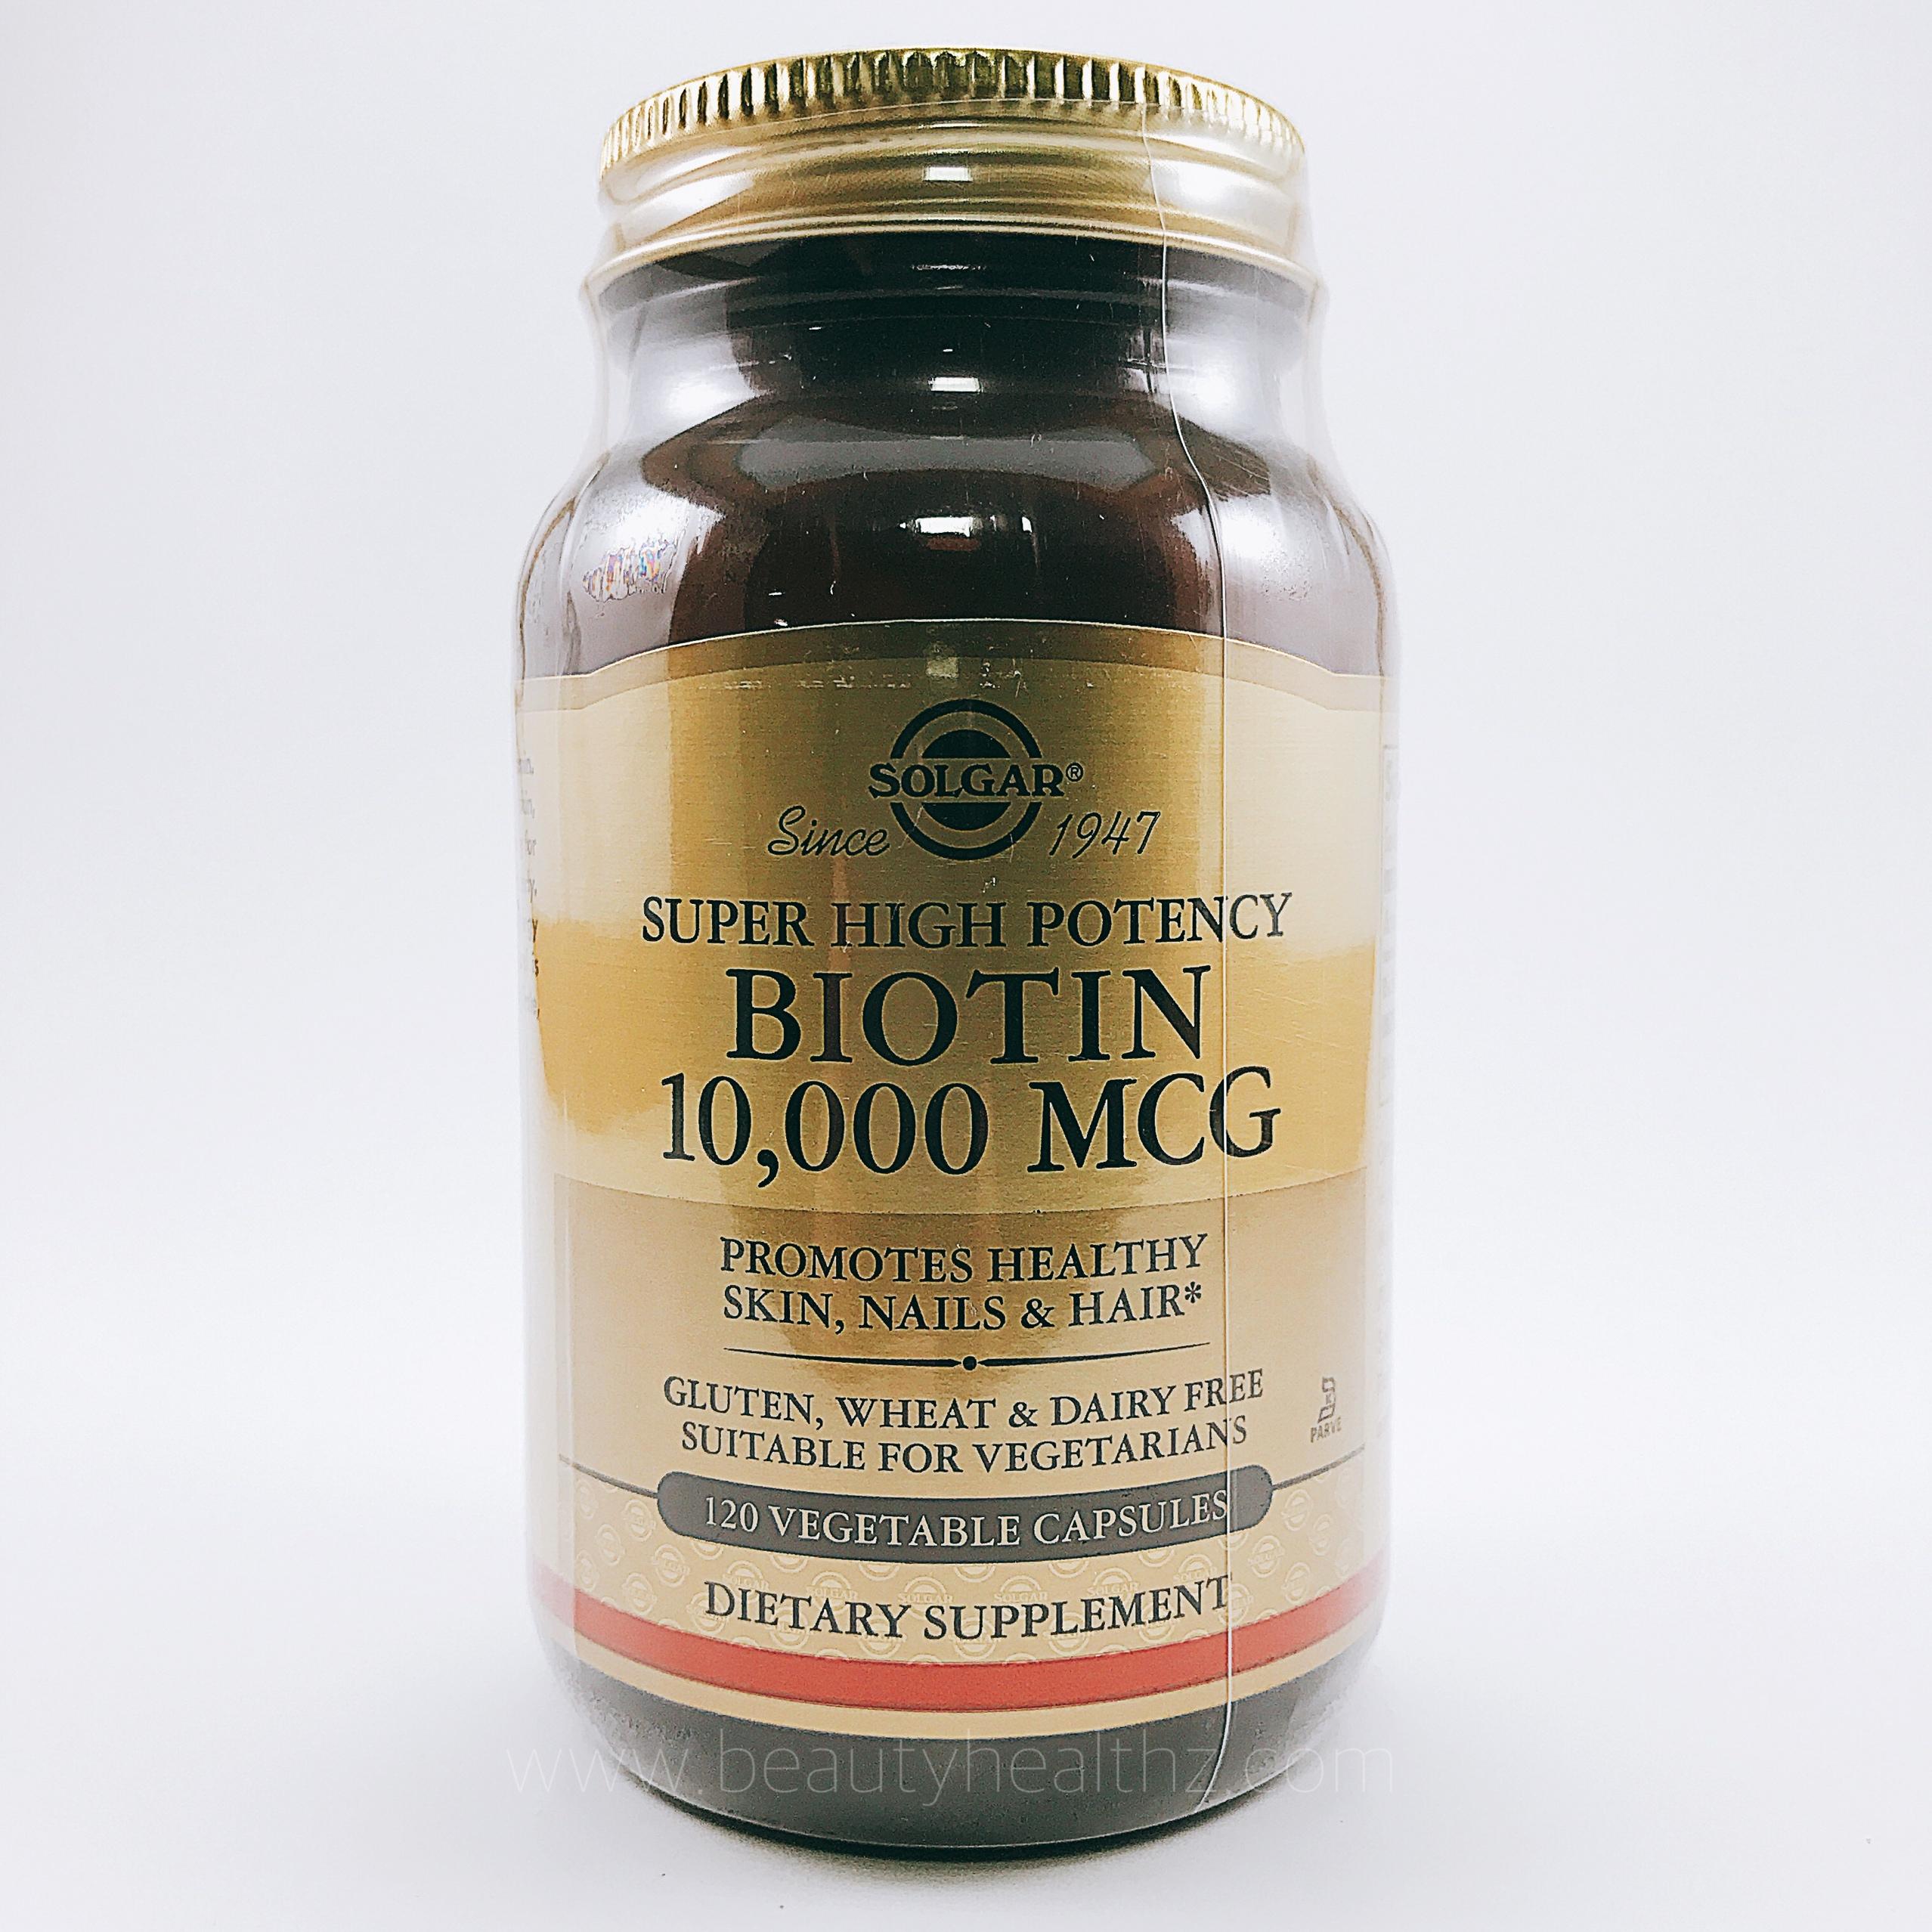 Solgar, Biotin, Super High Potency, 10,000 mcg, 120 Veggie Caps